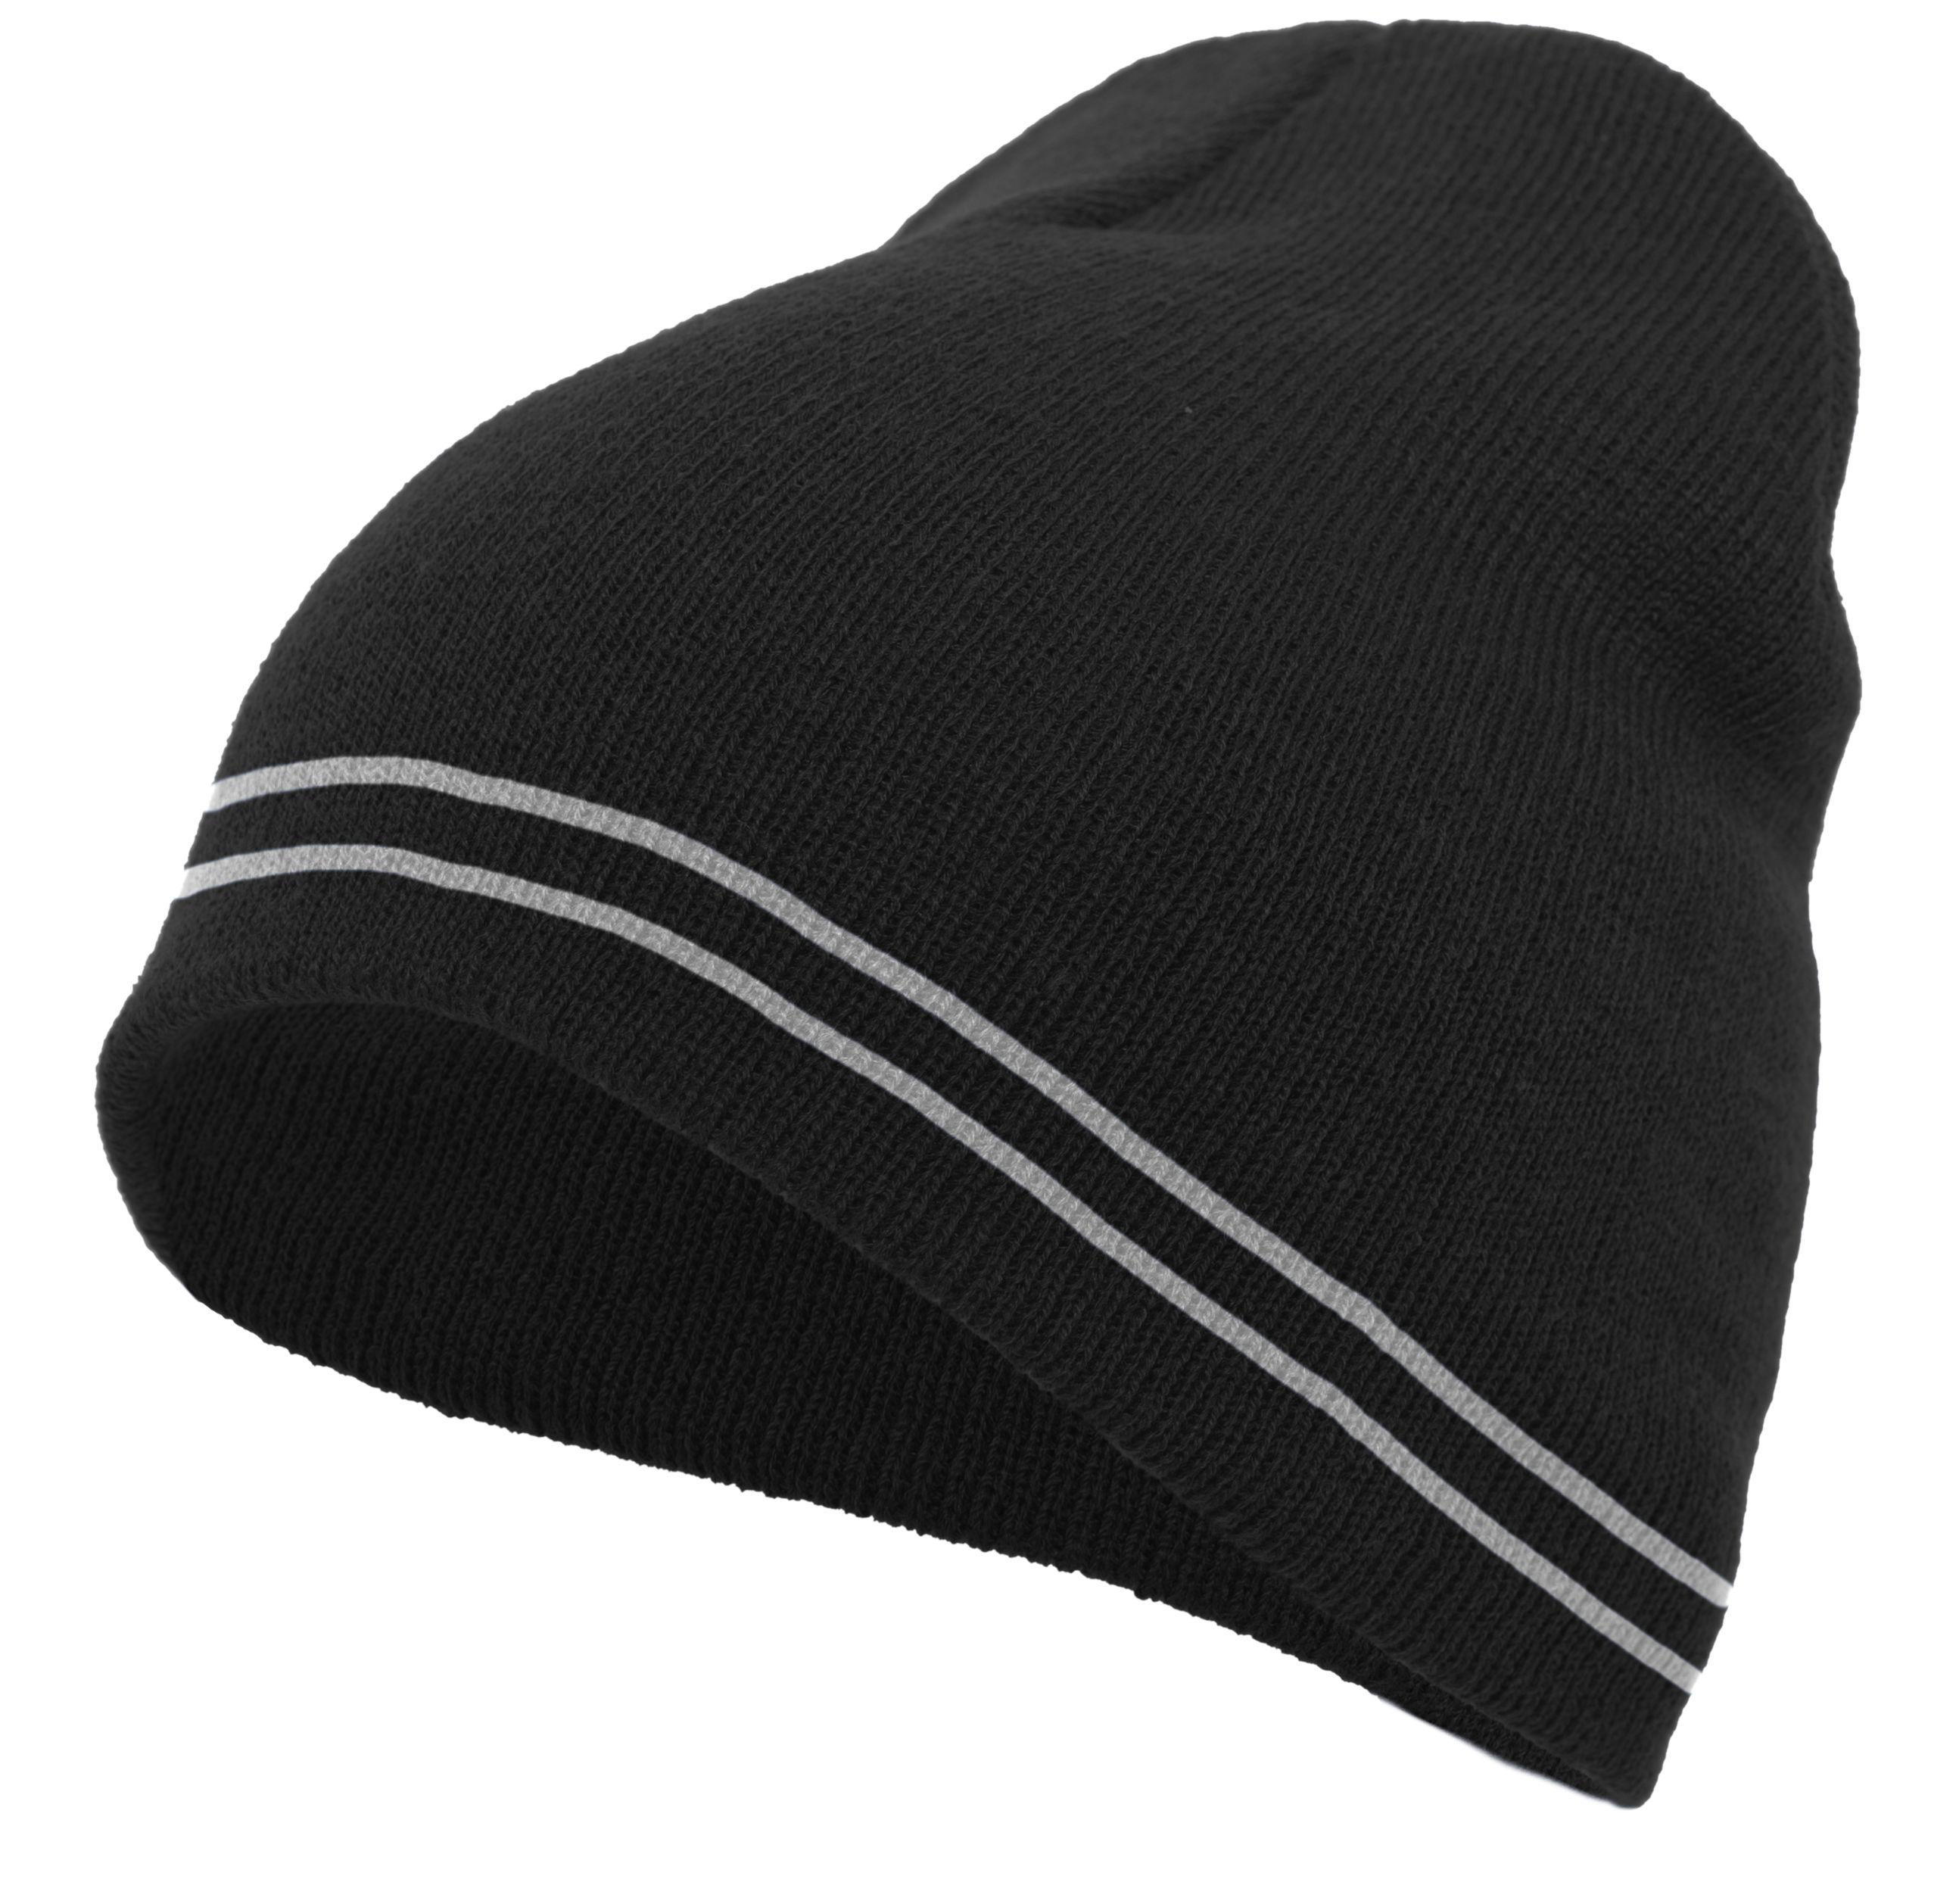 Basic Knit Beanie - BLACK/WHITE